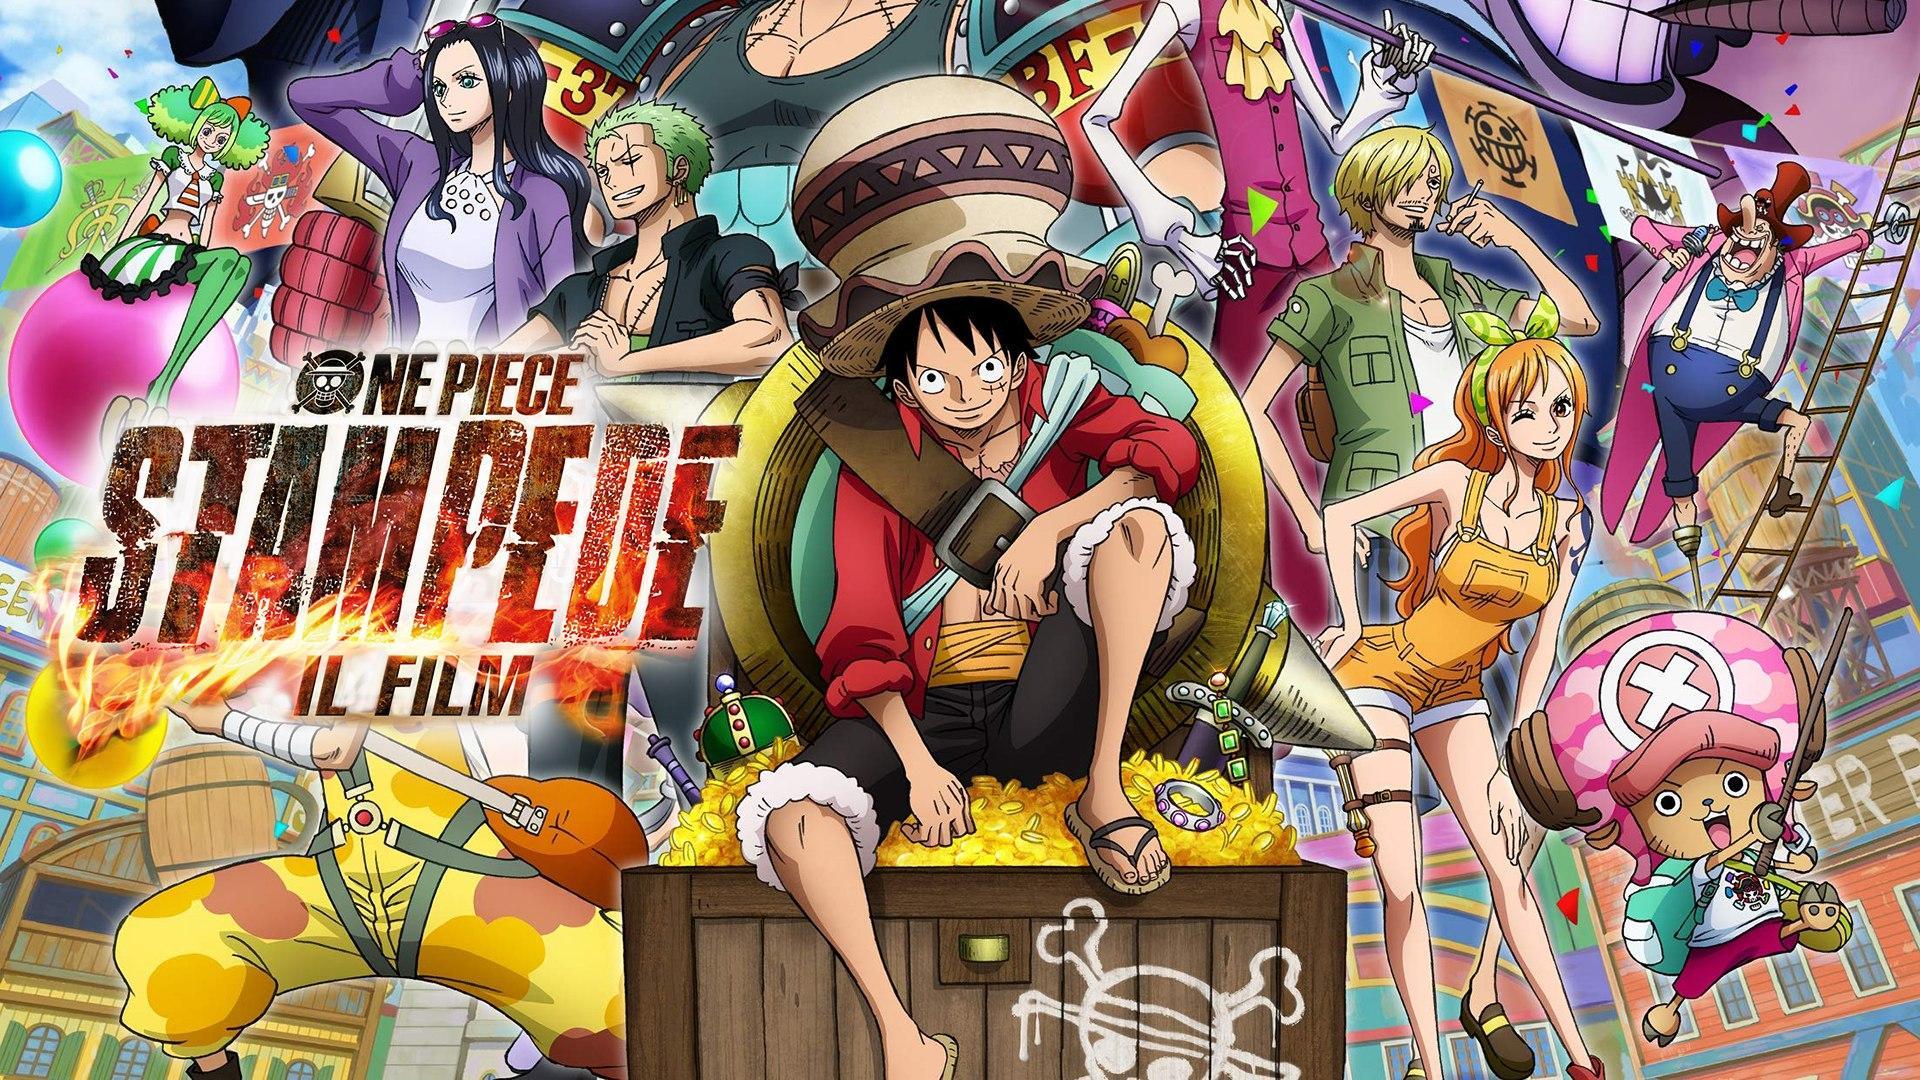 Sabato 15 Agosto 2020 Sky Cinema HD, One Piece: Stampede - Il film